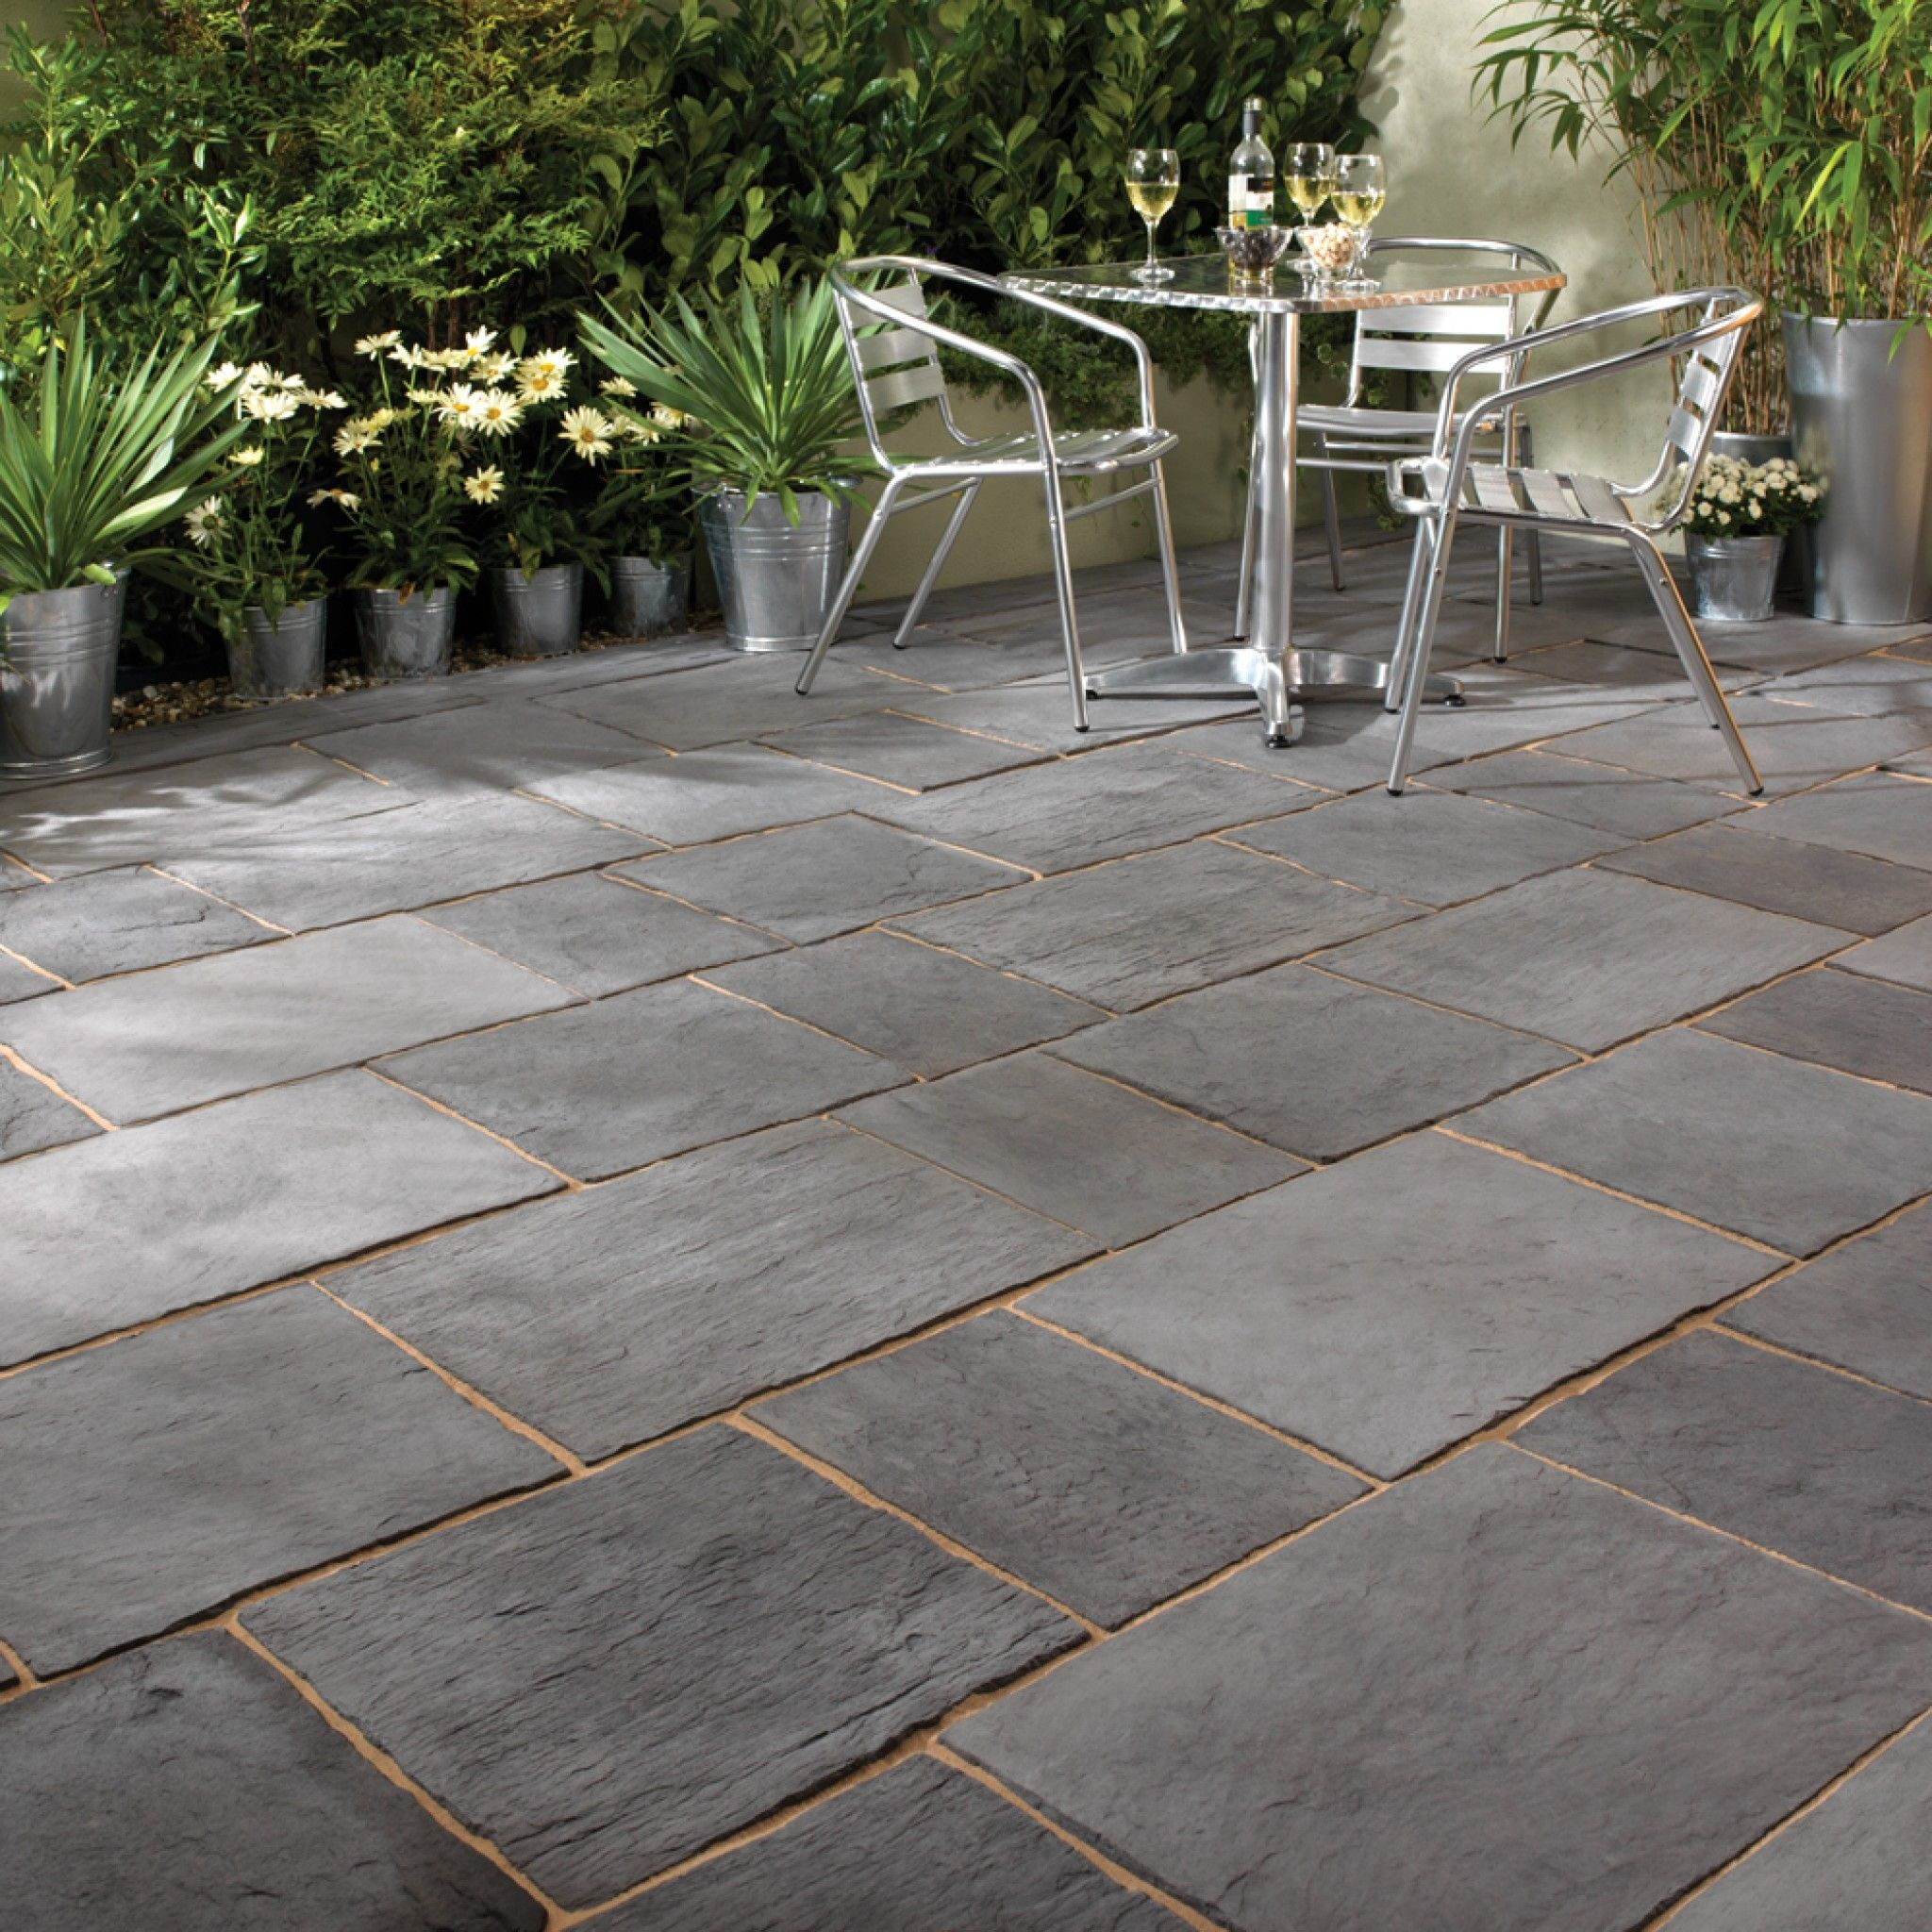 Bradstone Layered Slate Effect Paving Dark Grey Patio Pack 6 70 M2 Per Pack Premium Manufactured Paver Patio Patio Design Patio Stones